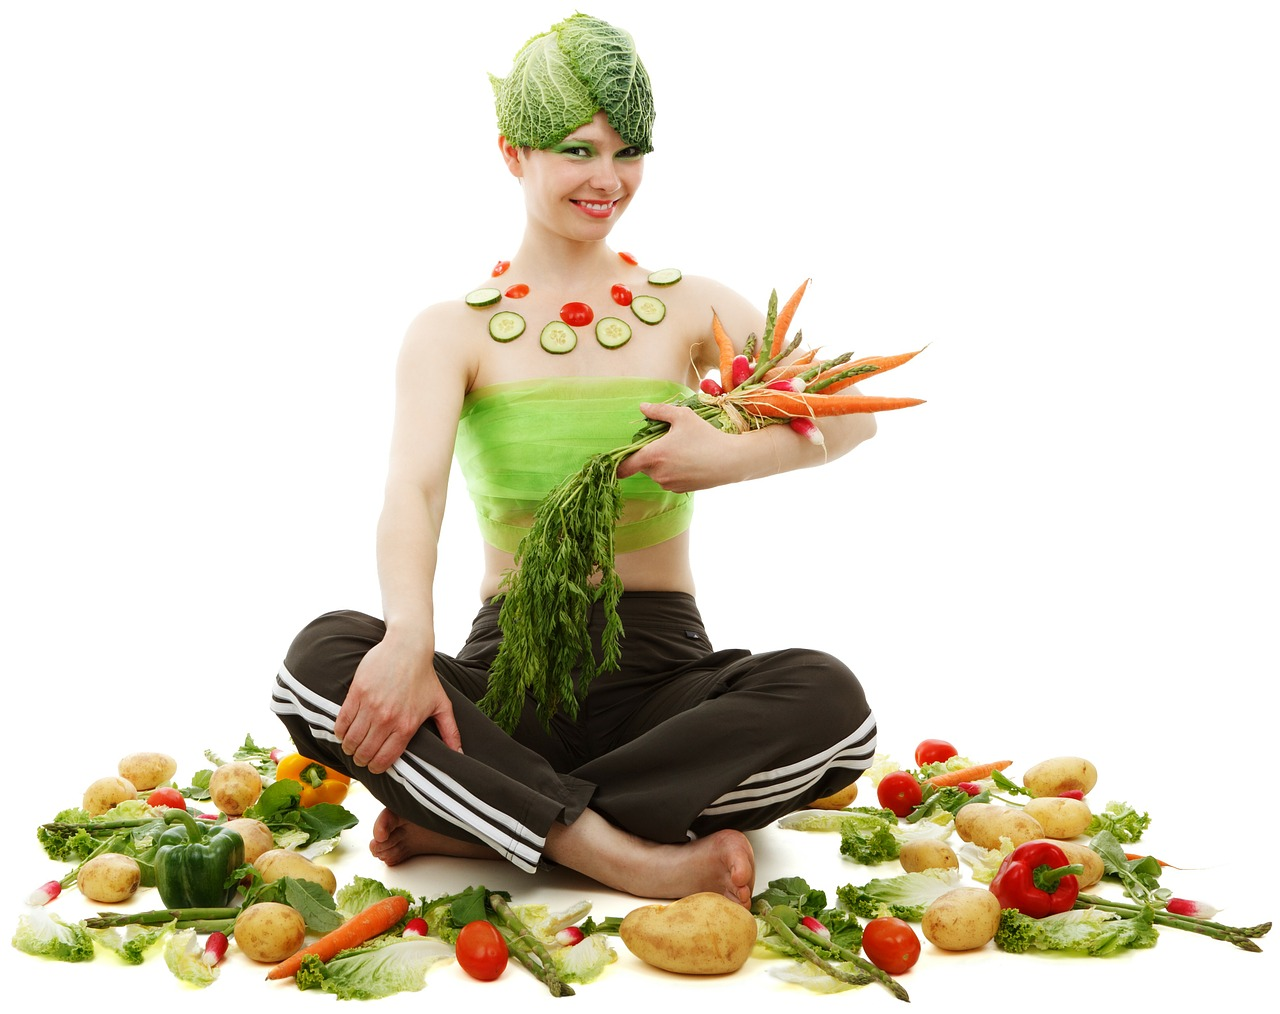 Mode de vie alimentaire sain